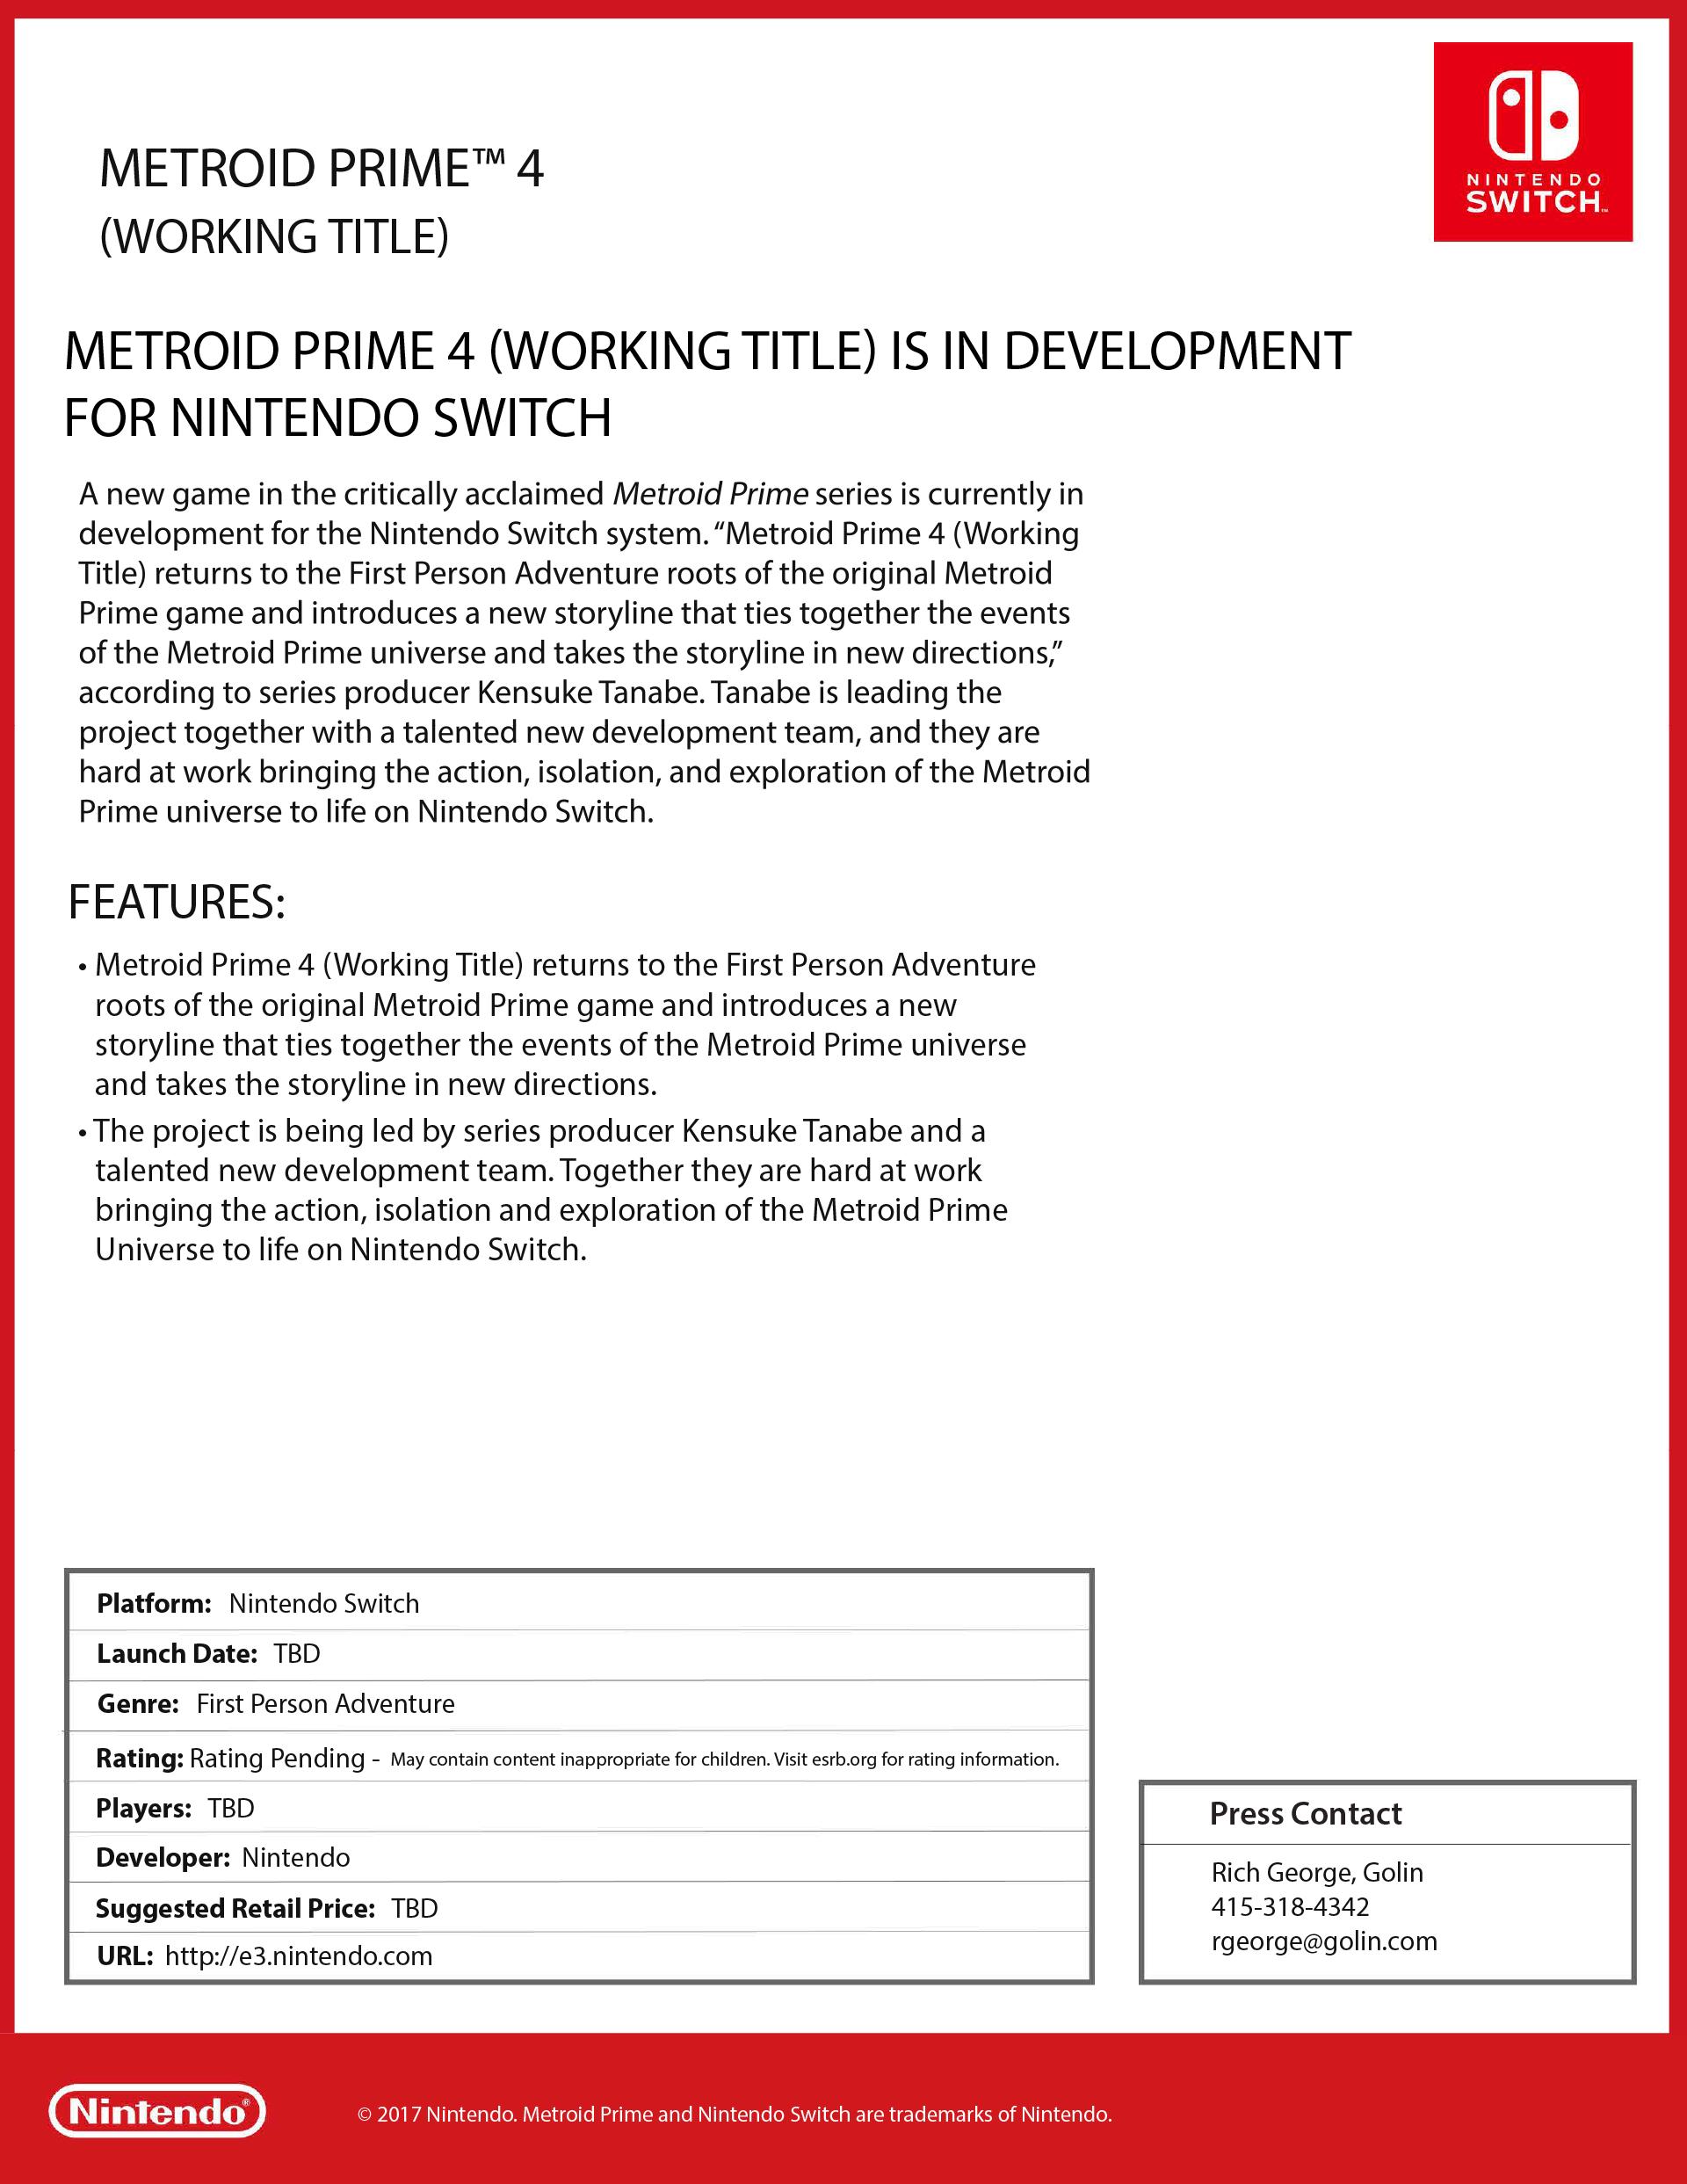 factsheet-e32017-metrlws0a.png